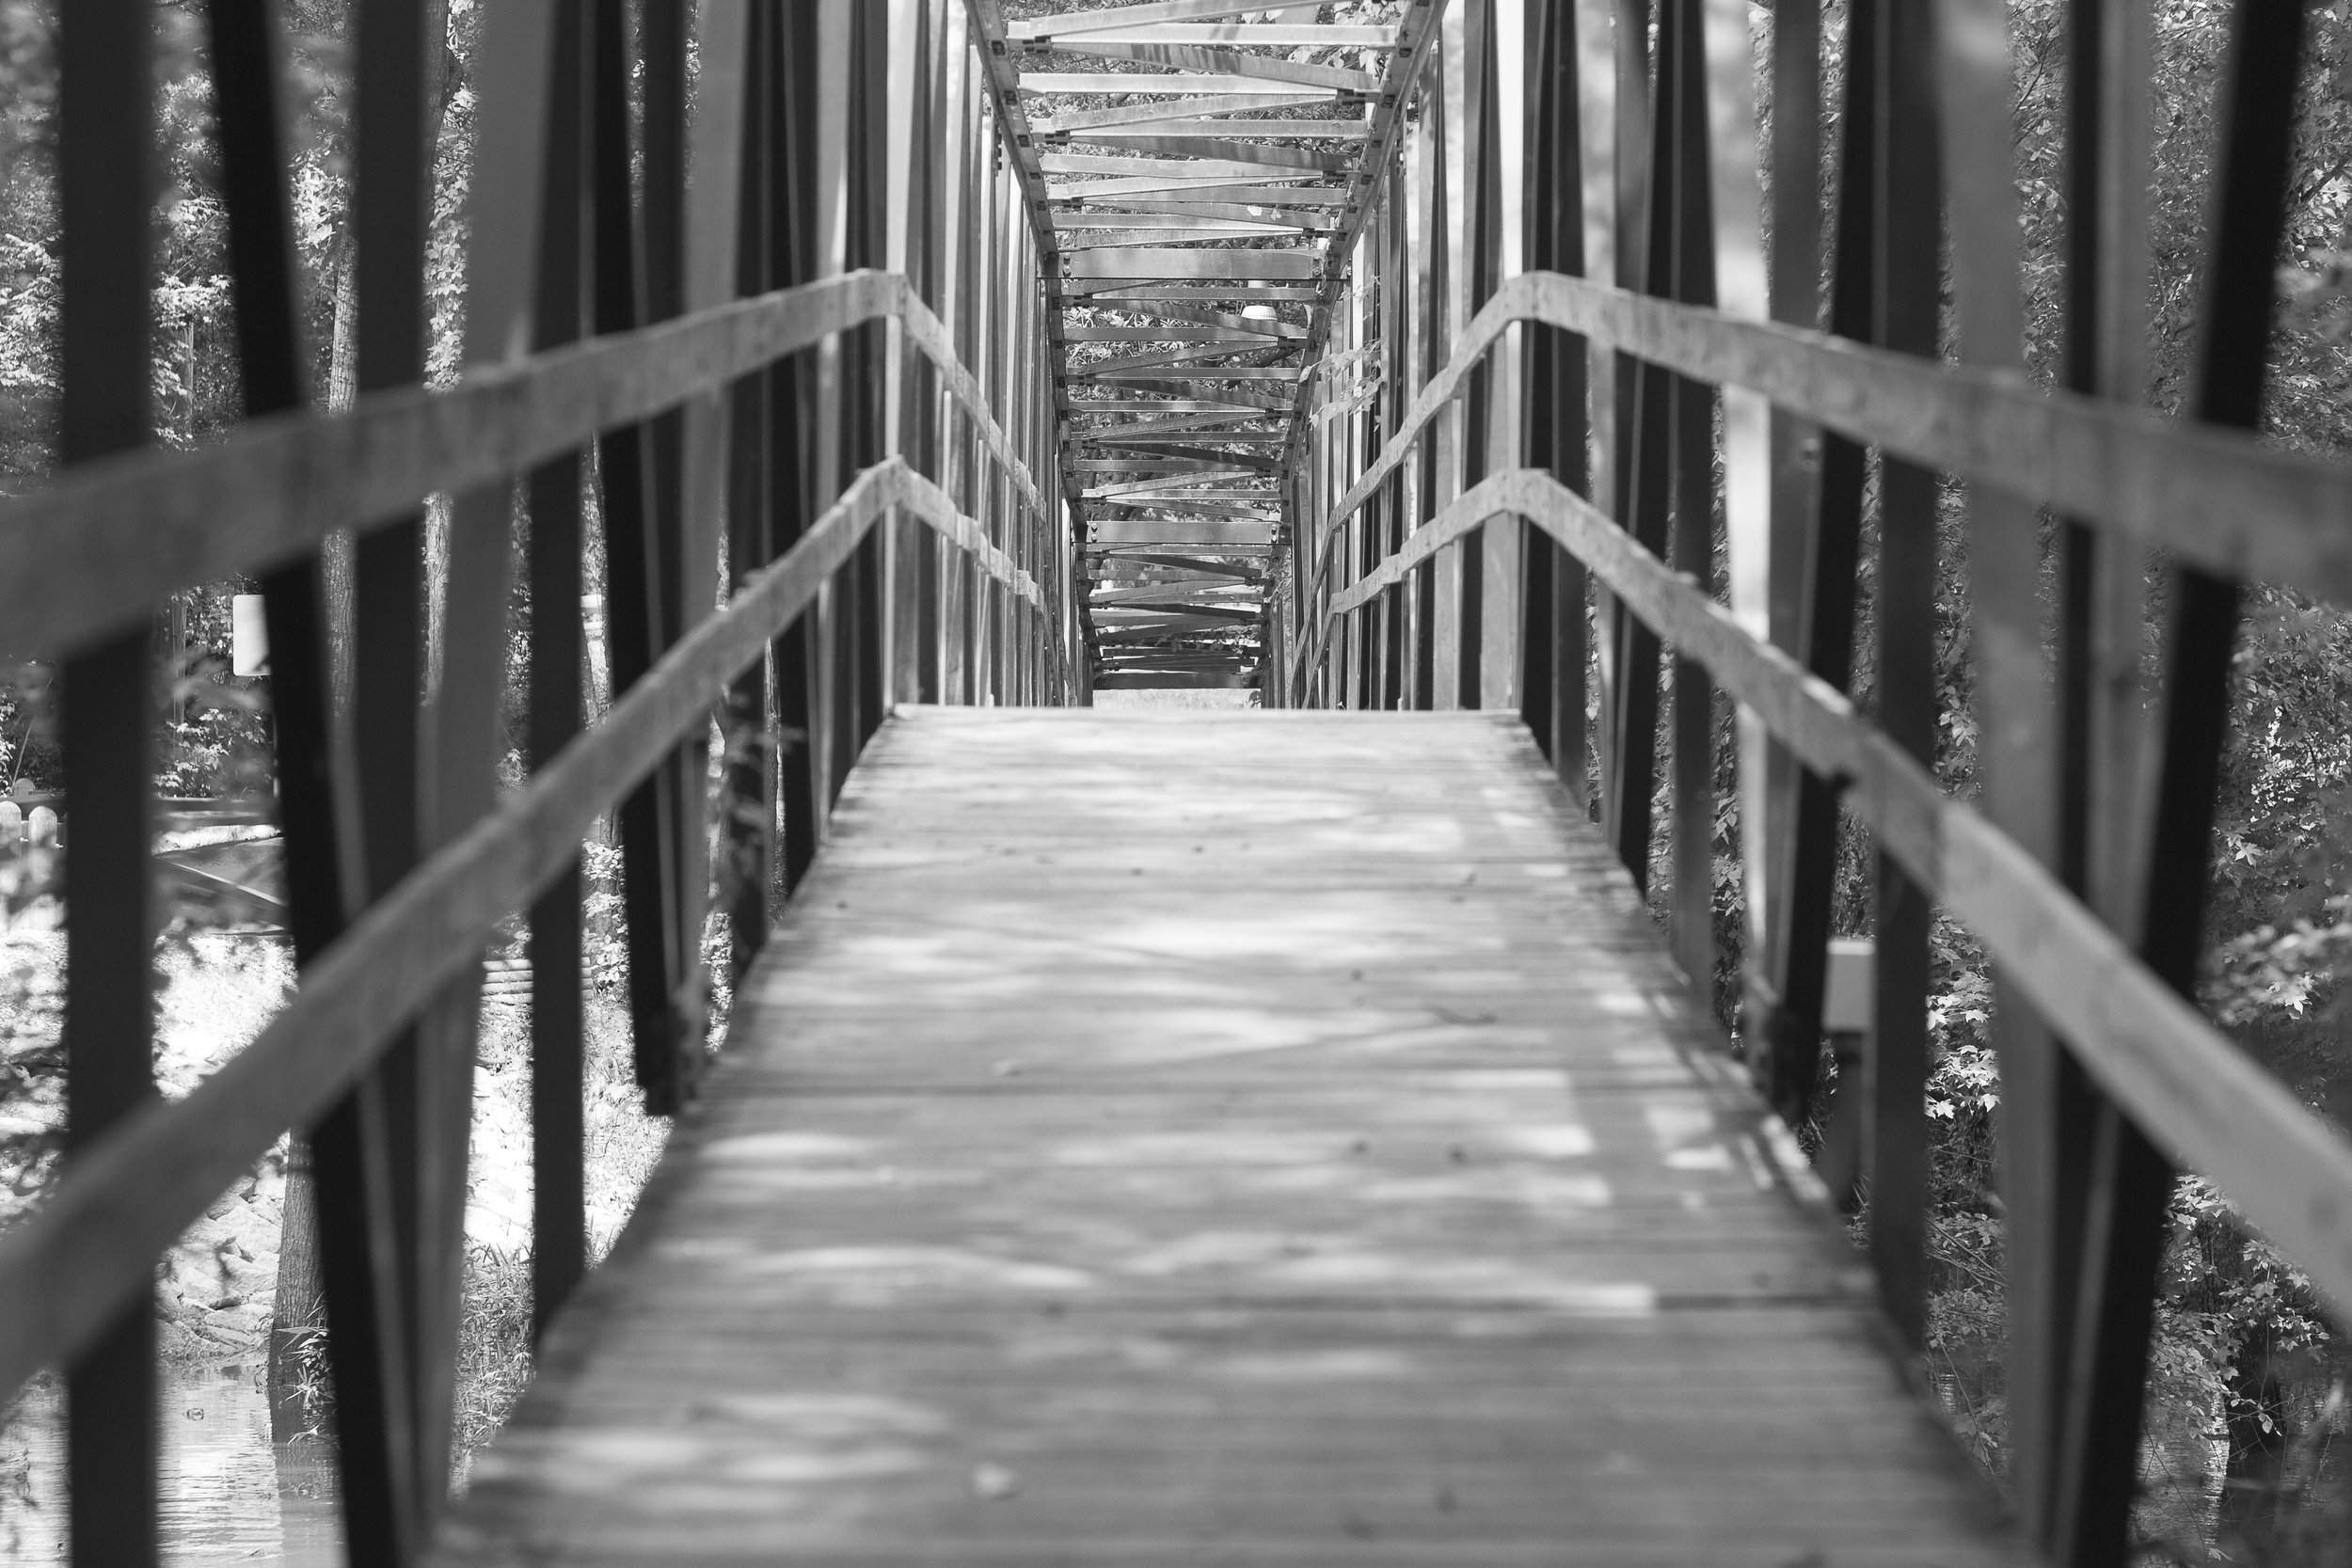 bw_footbridge_3704.JPG